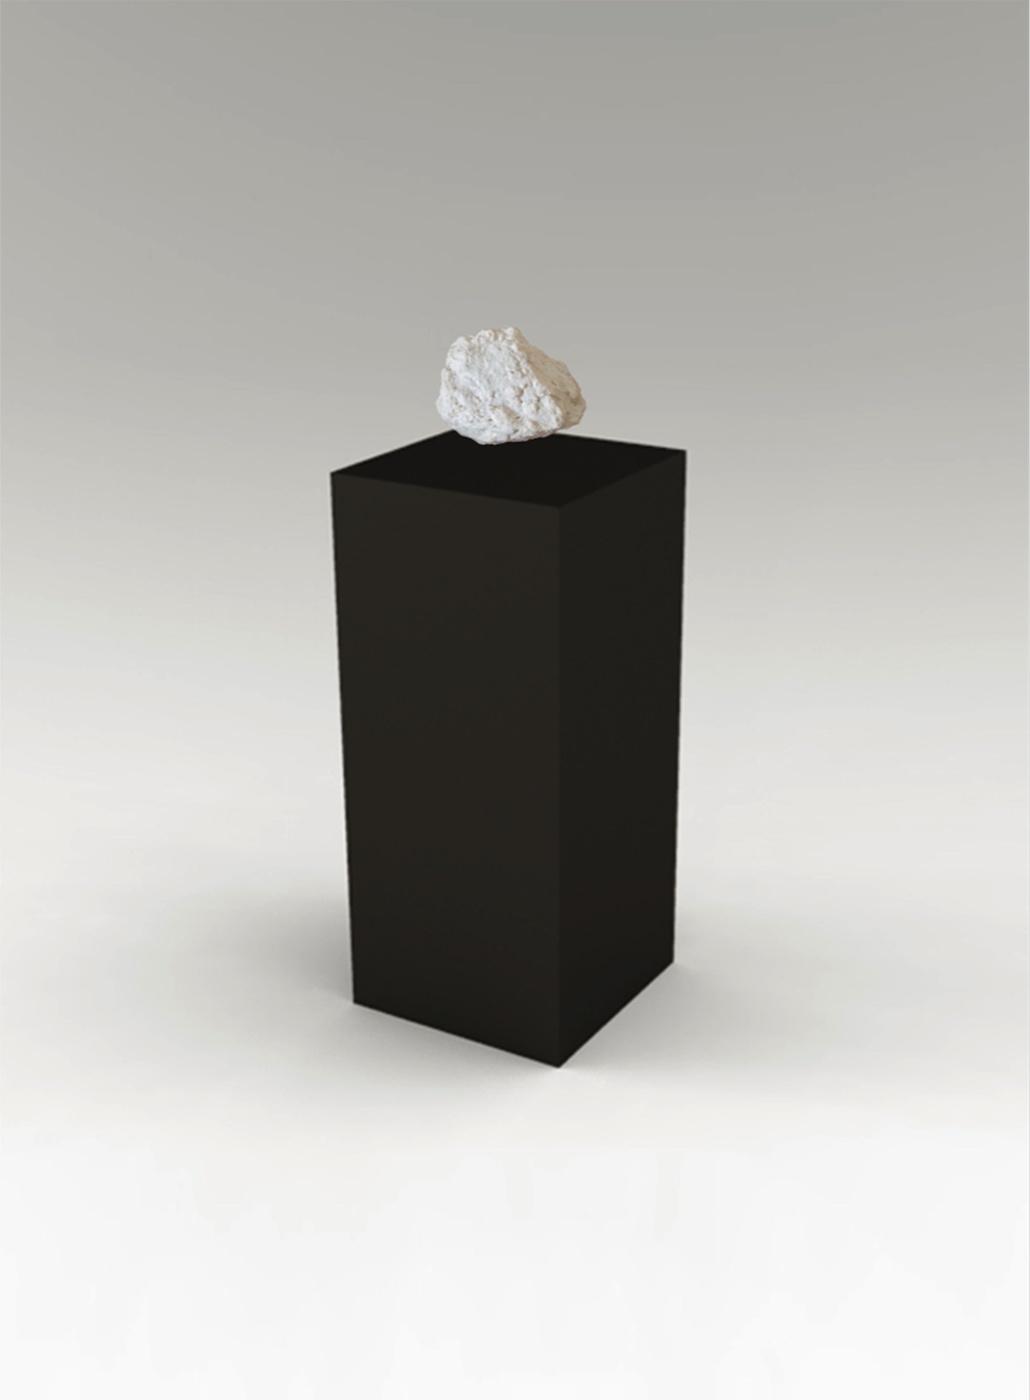 Mehreen Murtaza  Floating Stone 2013 Black plinth, Crealev levitation module CLM-1 and fiberglass scaled model of floating stone of Jerusalem 121.92 x 20.32 x 20.32 cm (plinth) and 11.43 x 20.32 cm (stone)